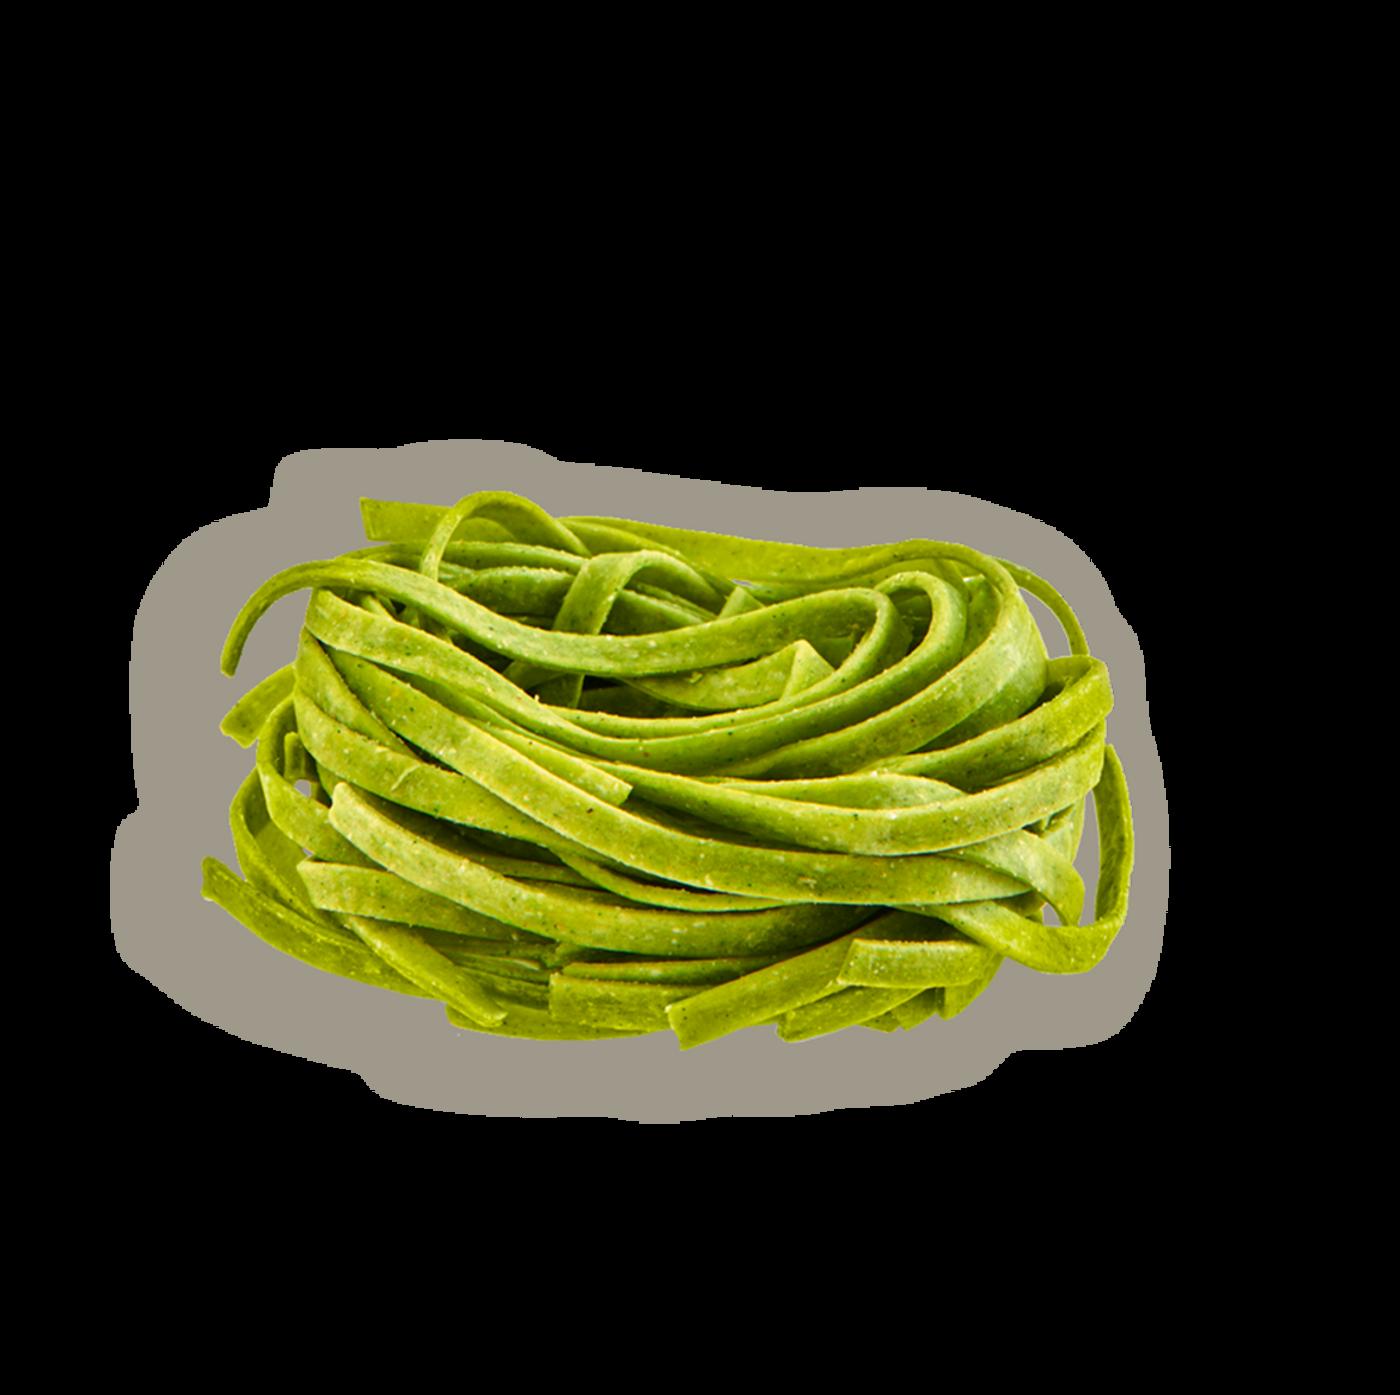 Taglioline Verdi